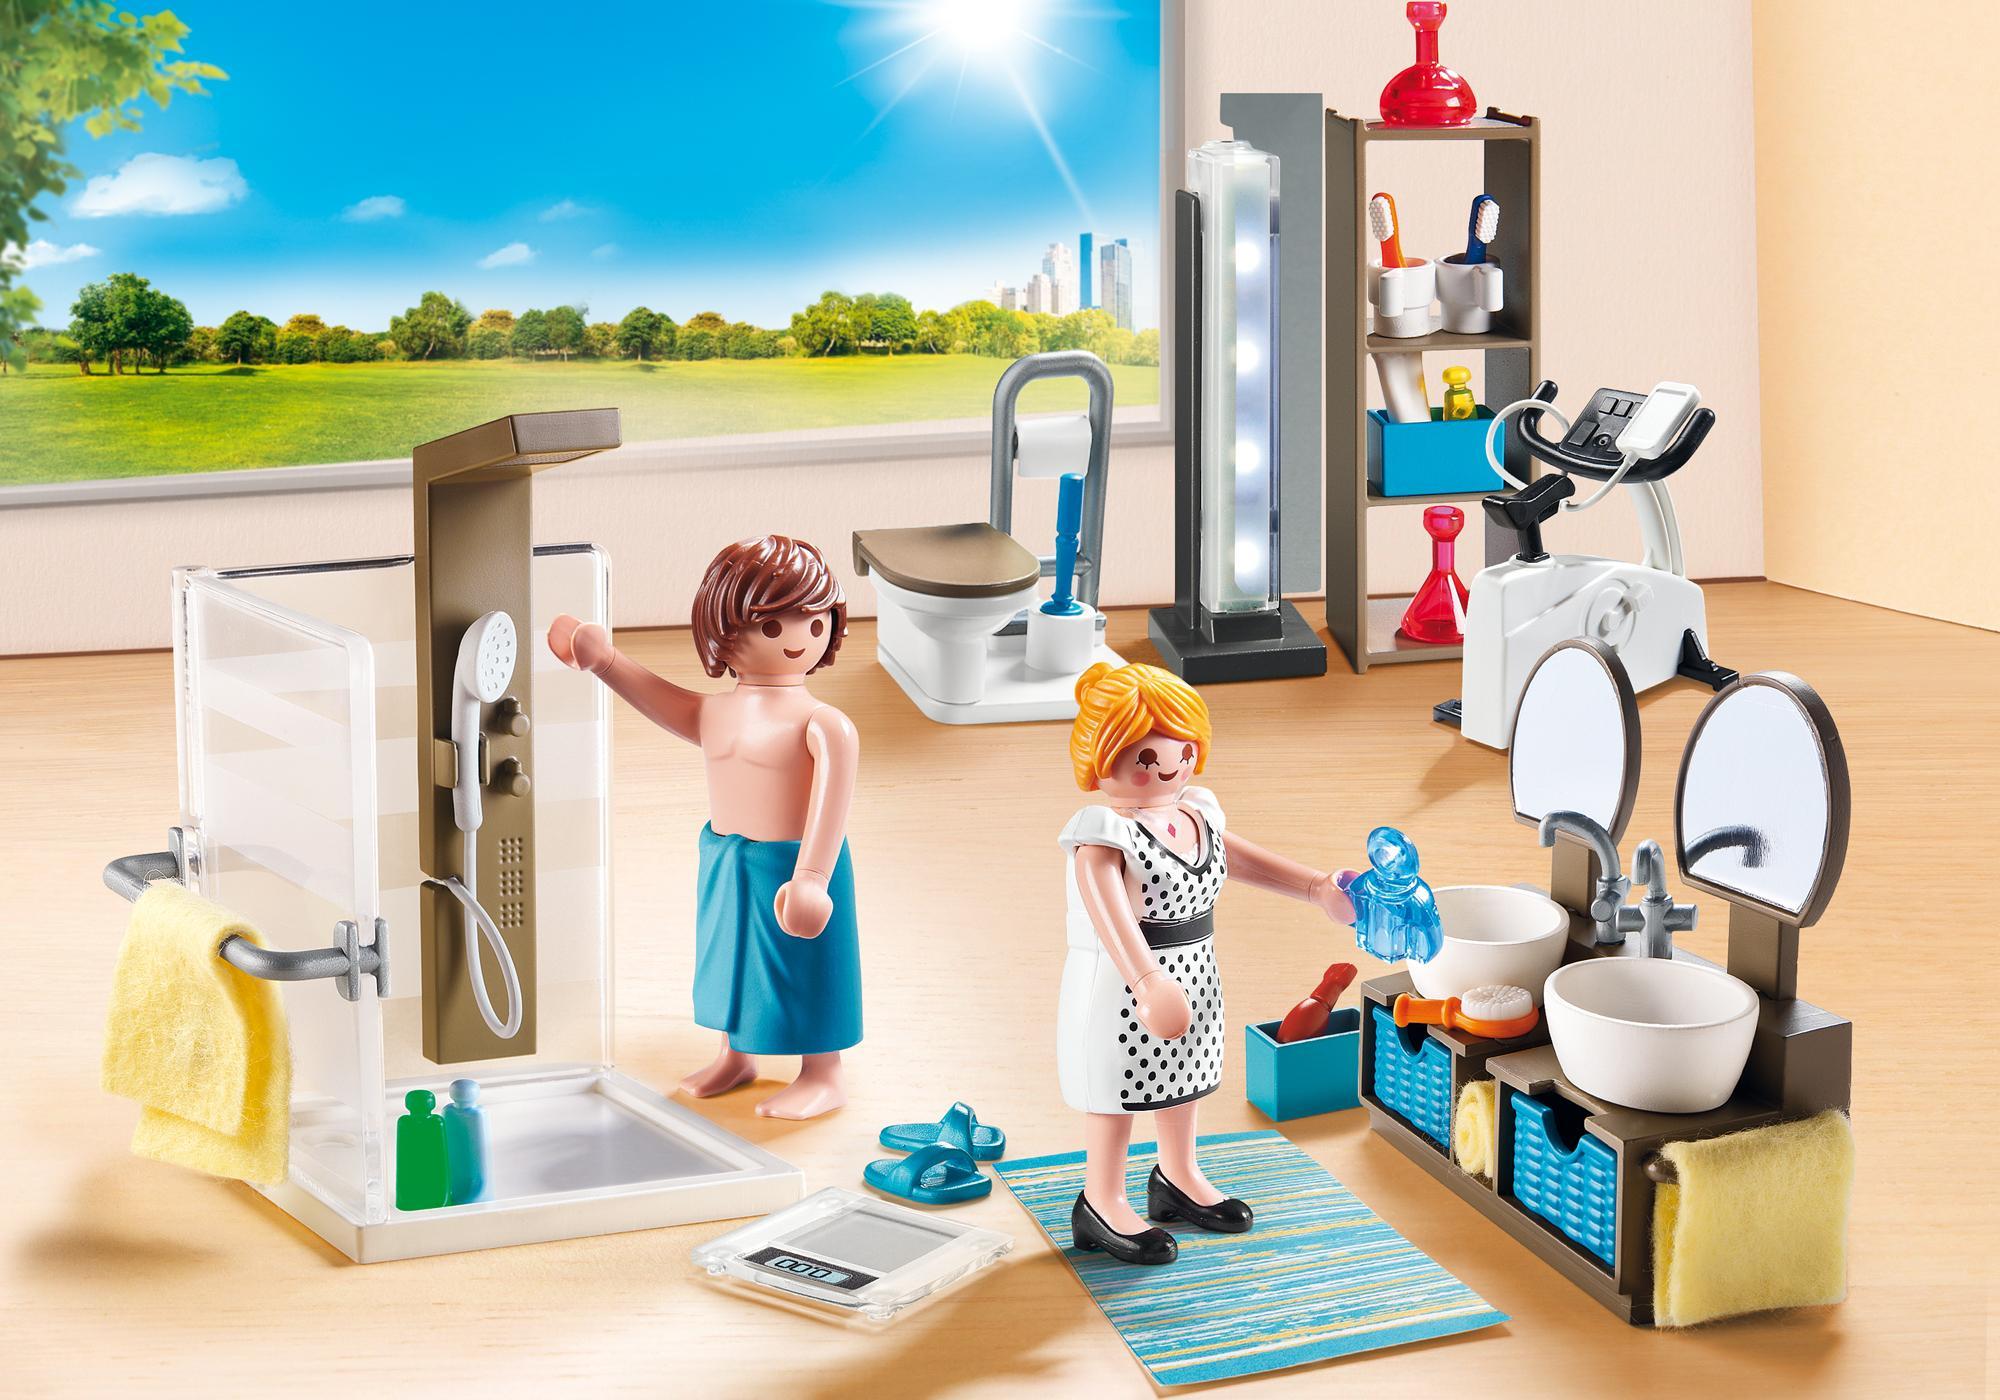 http://media.playmobil.com/i/playmobil/9268_product_detail/Bathroom